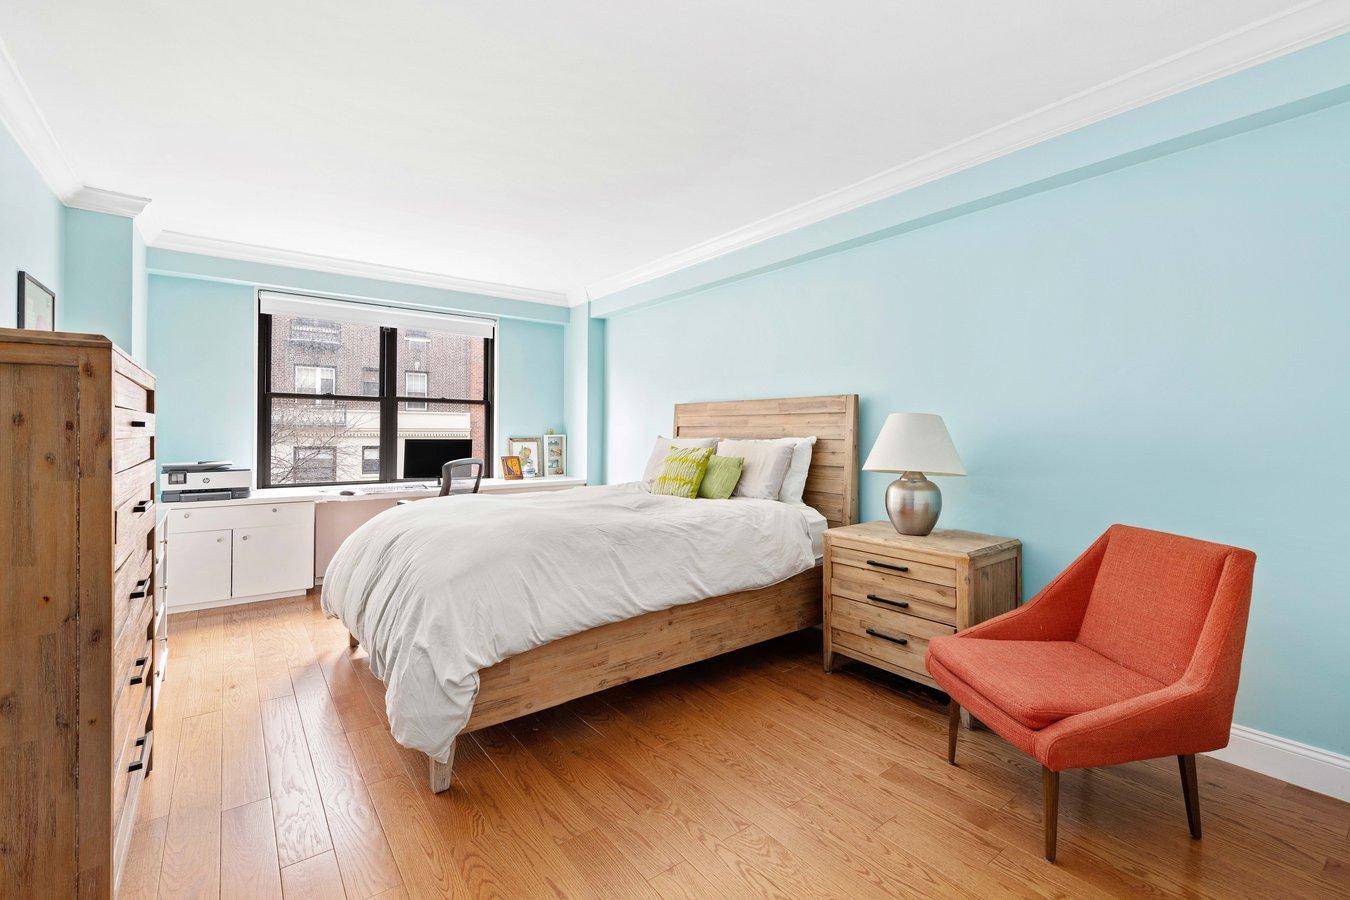 120 East 90th Street Carnegie Hill New York NY 10128